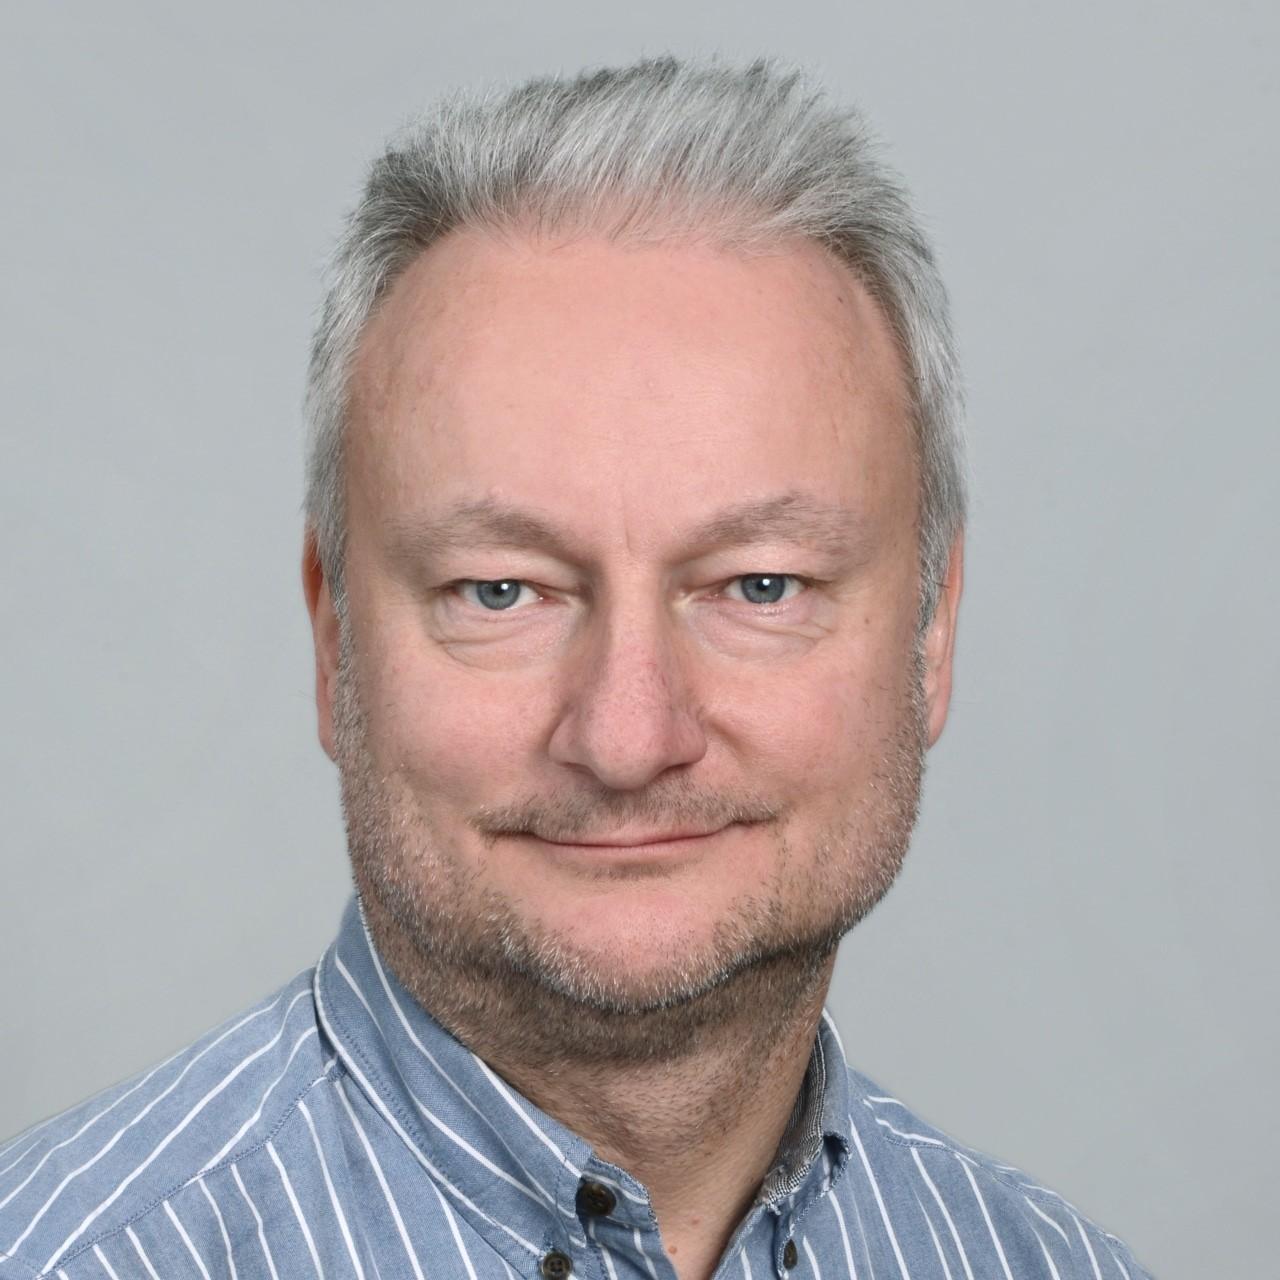 Radovan Burkovič